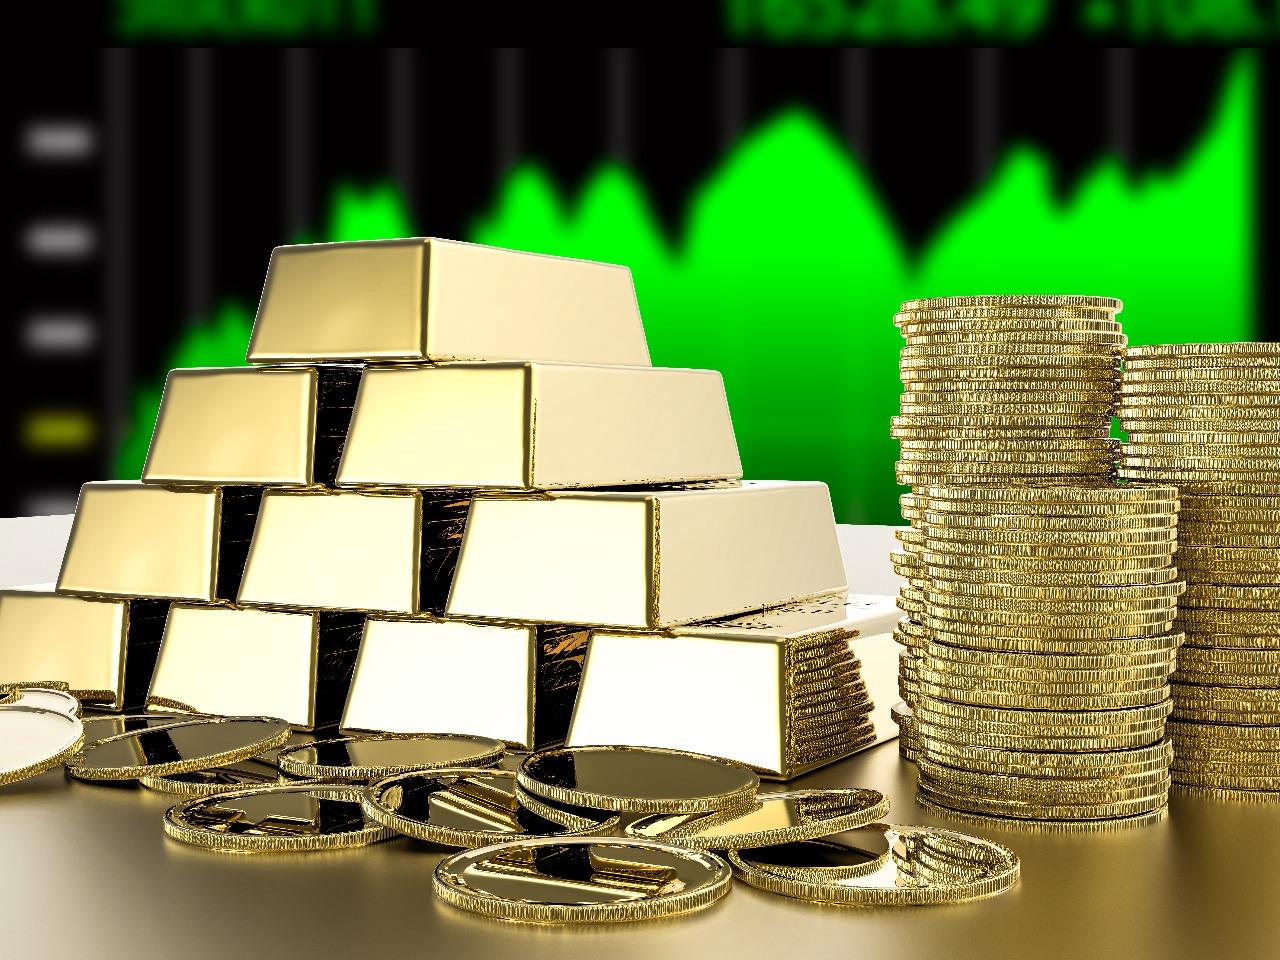 https: img-o.okeinfo.net content 2019 05 14 320 2055359 harga-emas-naik-1-ke-level-usd1-300-per-ounce-jnOTTMgxA1.jpg